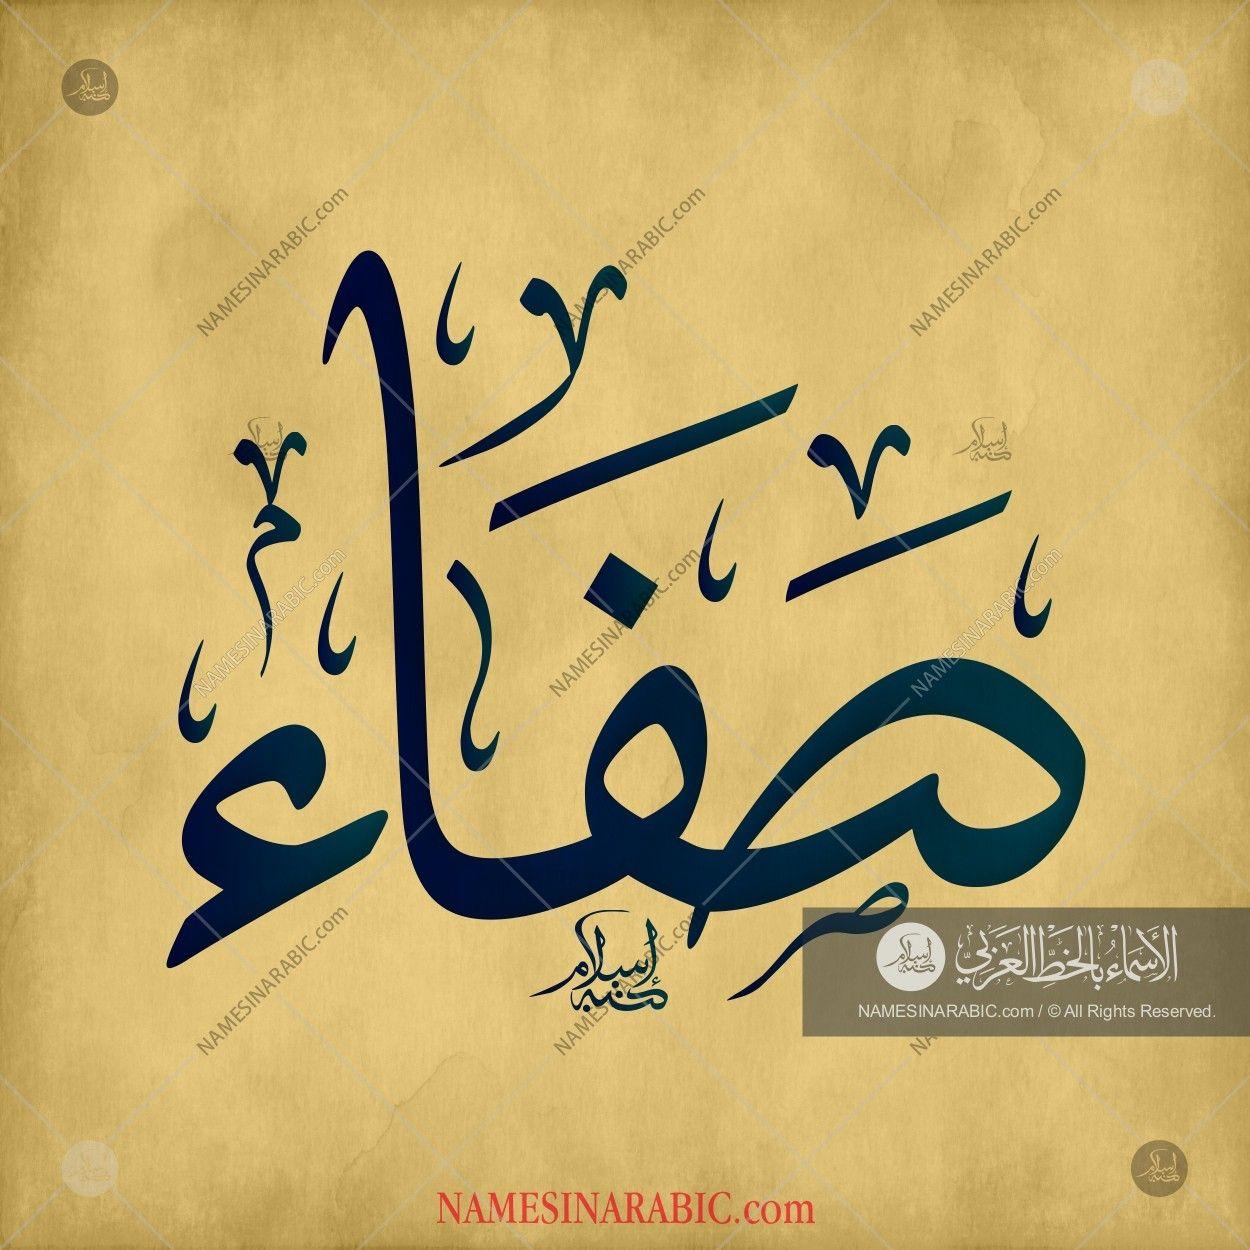 Safa صفاء Names In Arabic Calligraphy Name 1869 Calligraphy Name Name Drawings Calligraphy